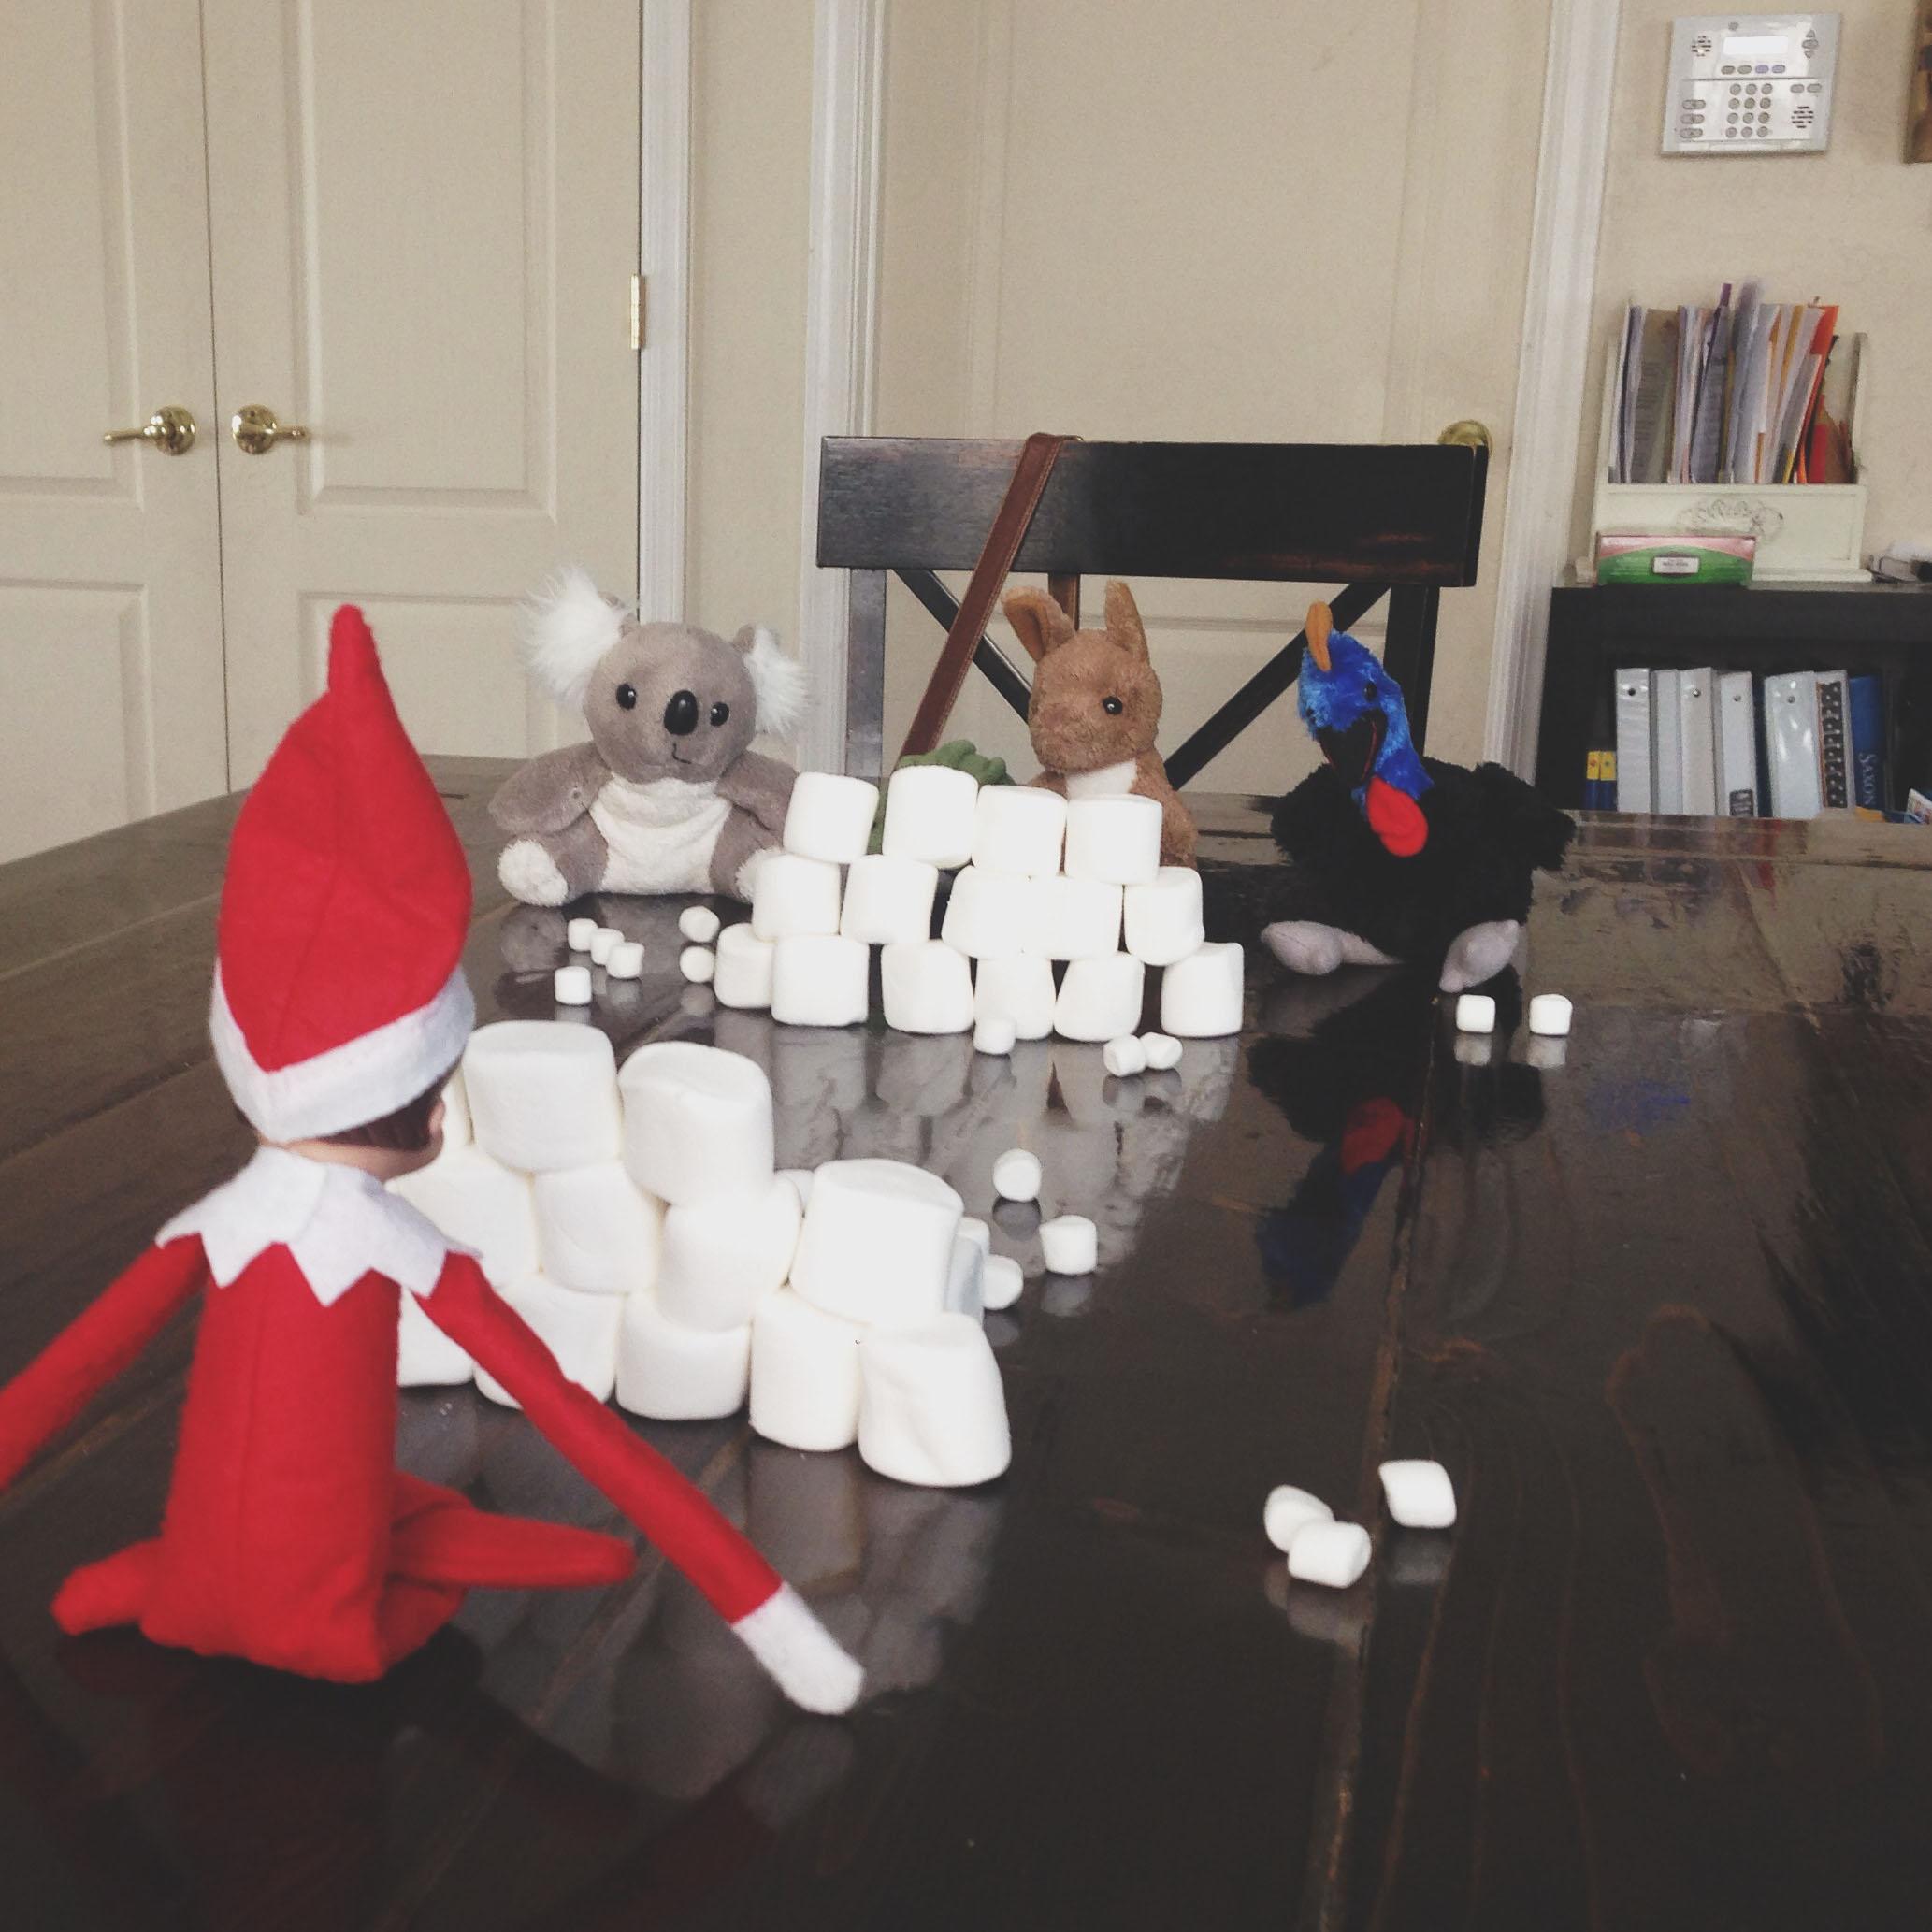 Elf having a snowball fight.